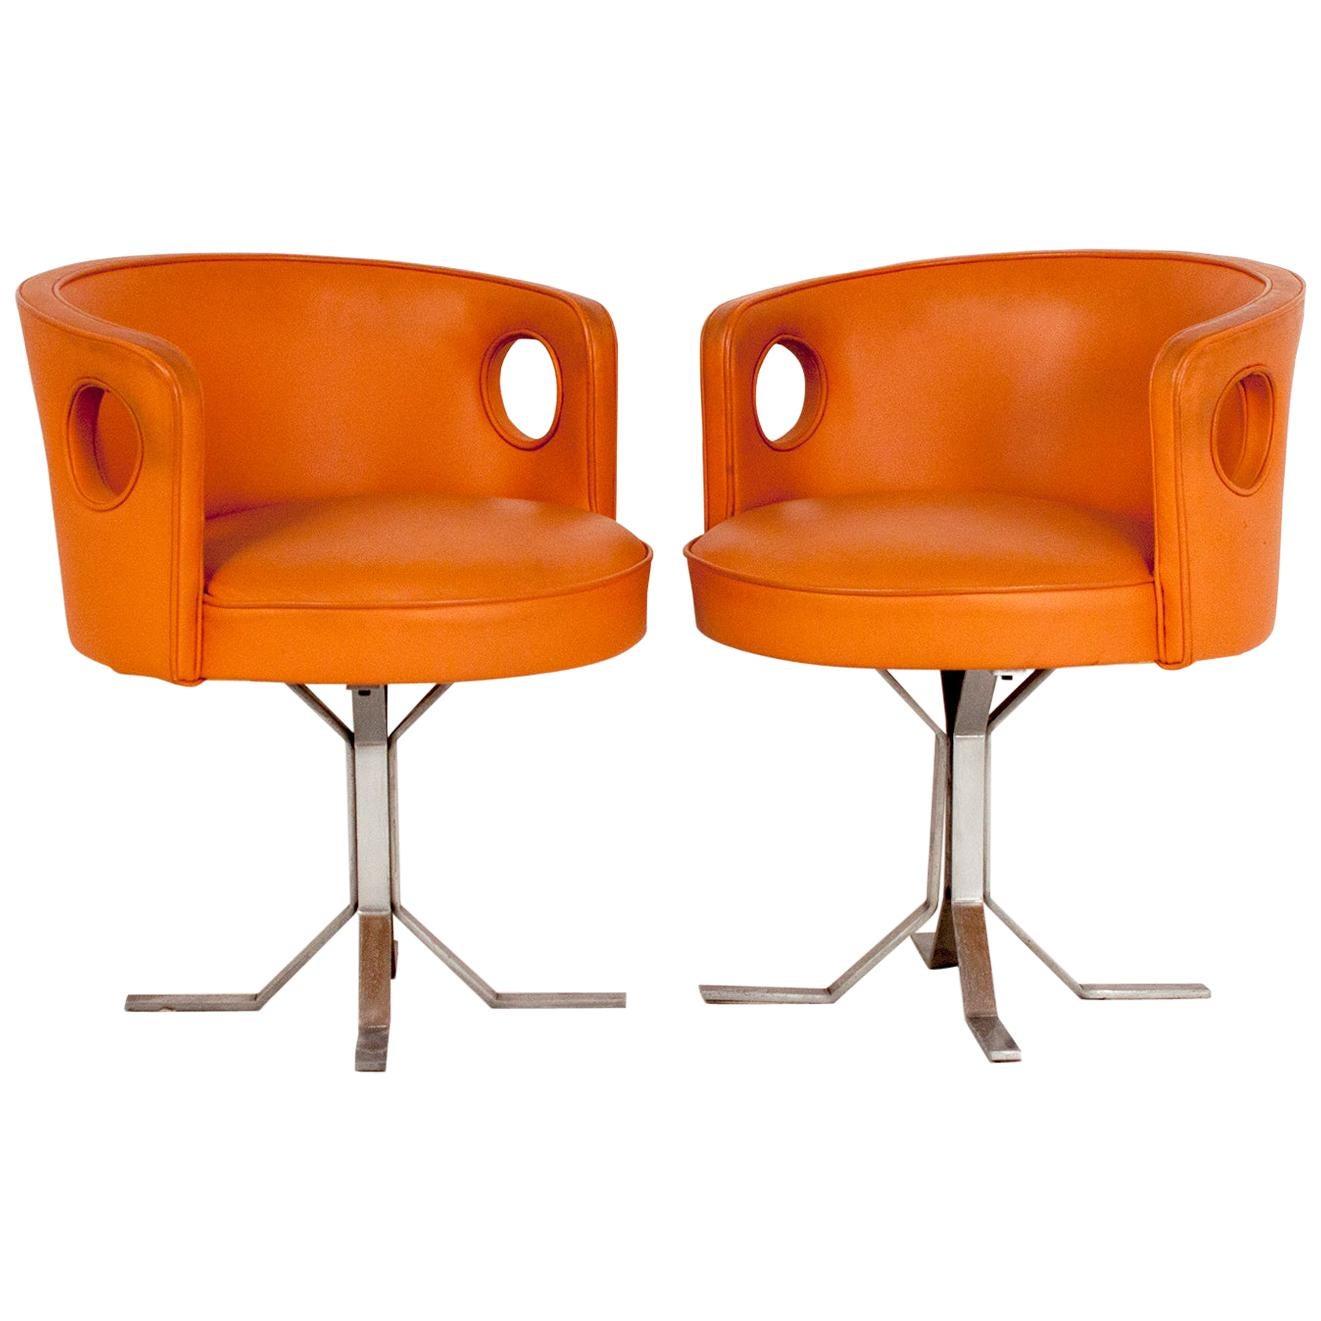 Jordi Vilanova pair of Midcentury Orange Leather Chairs, 1970s